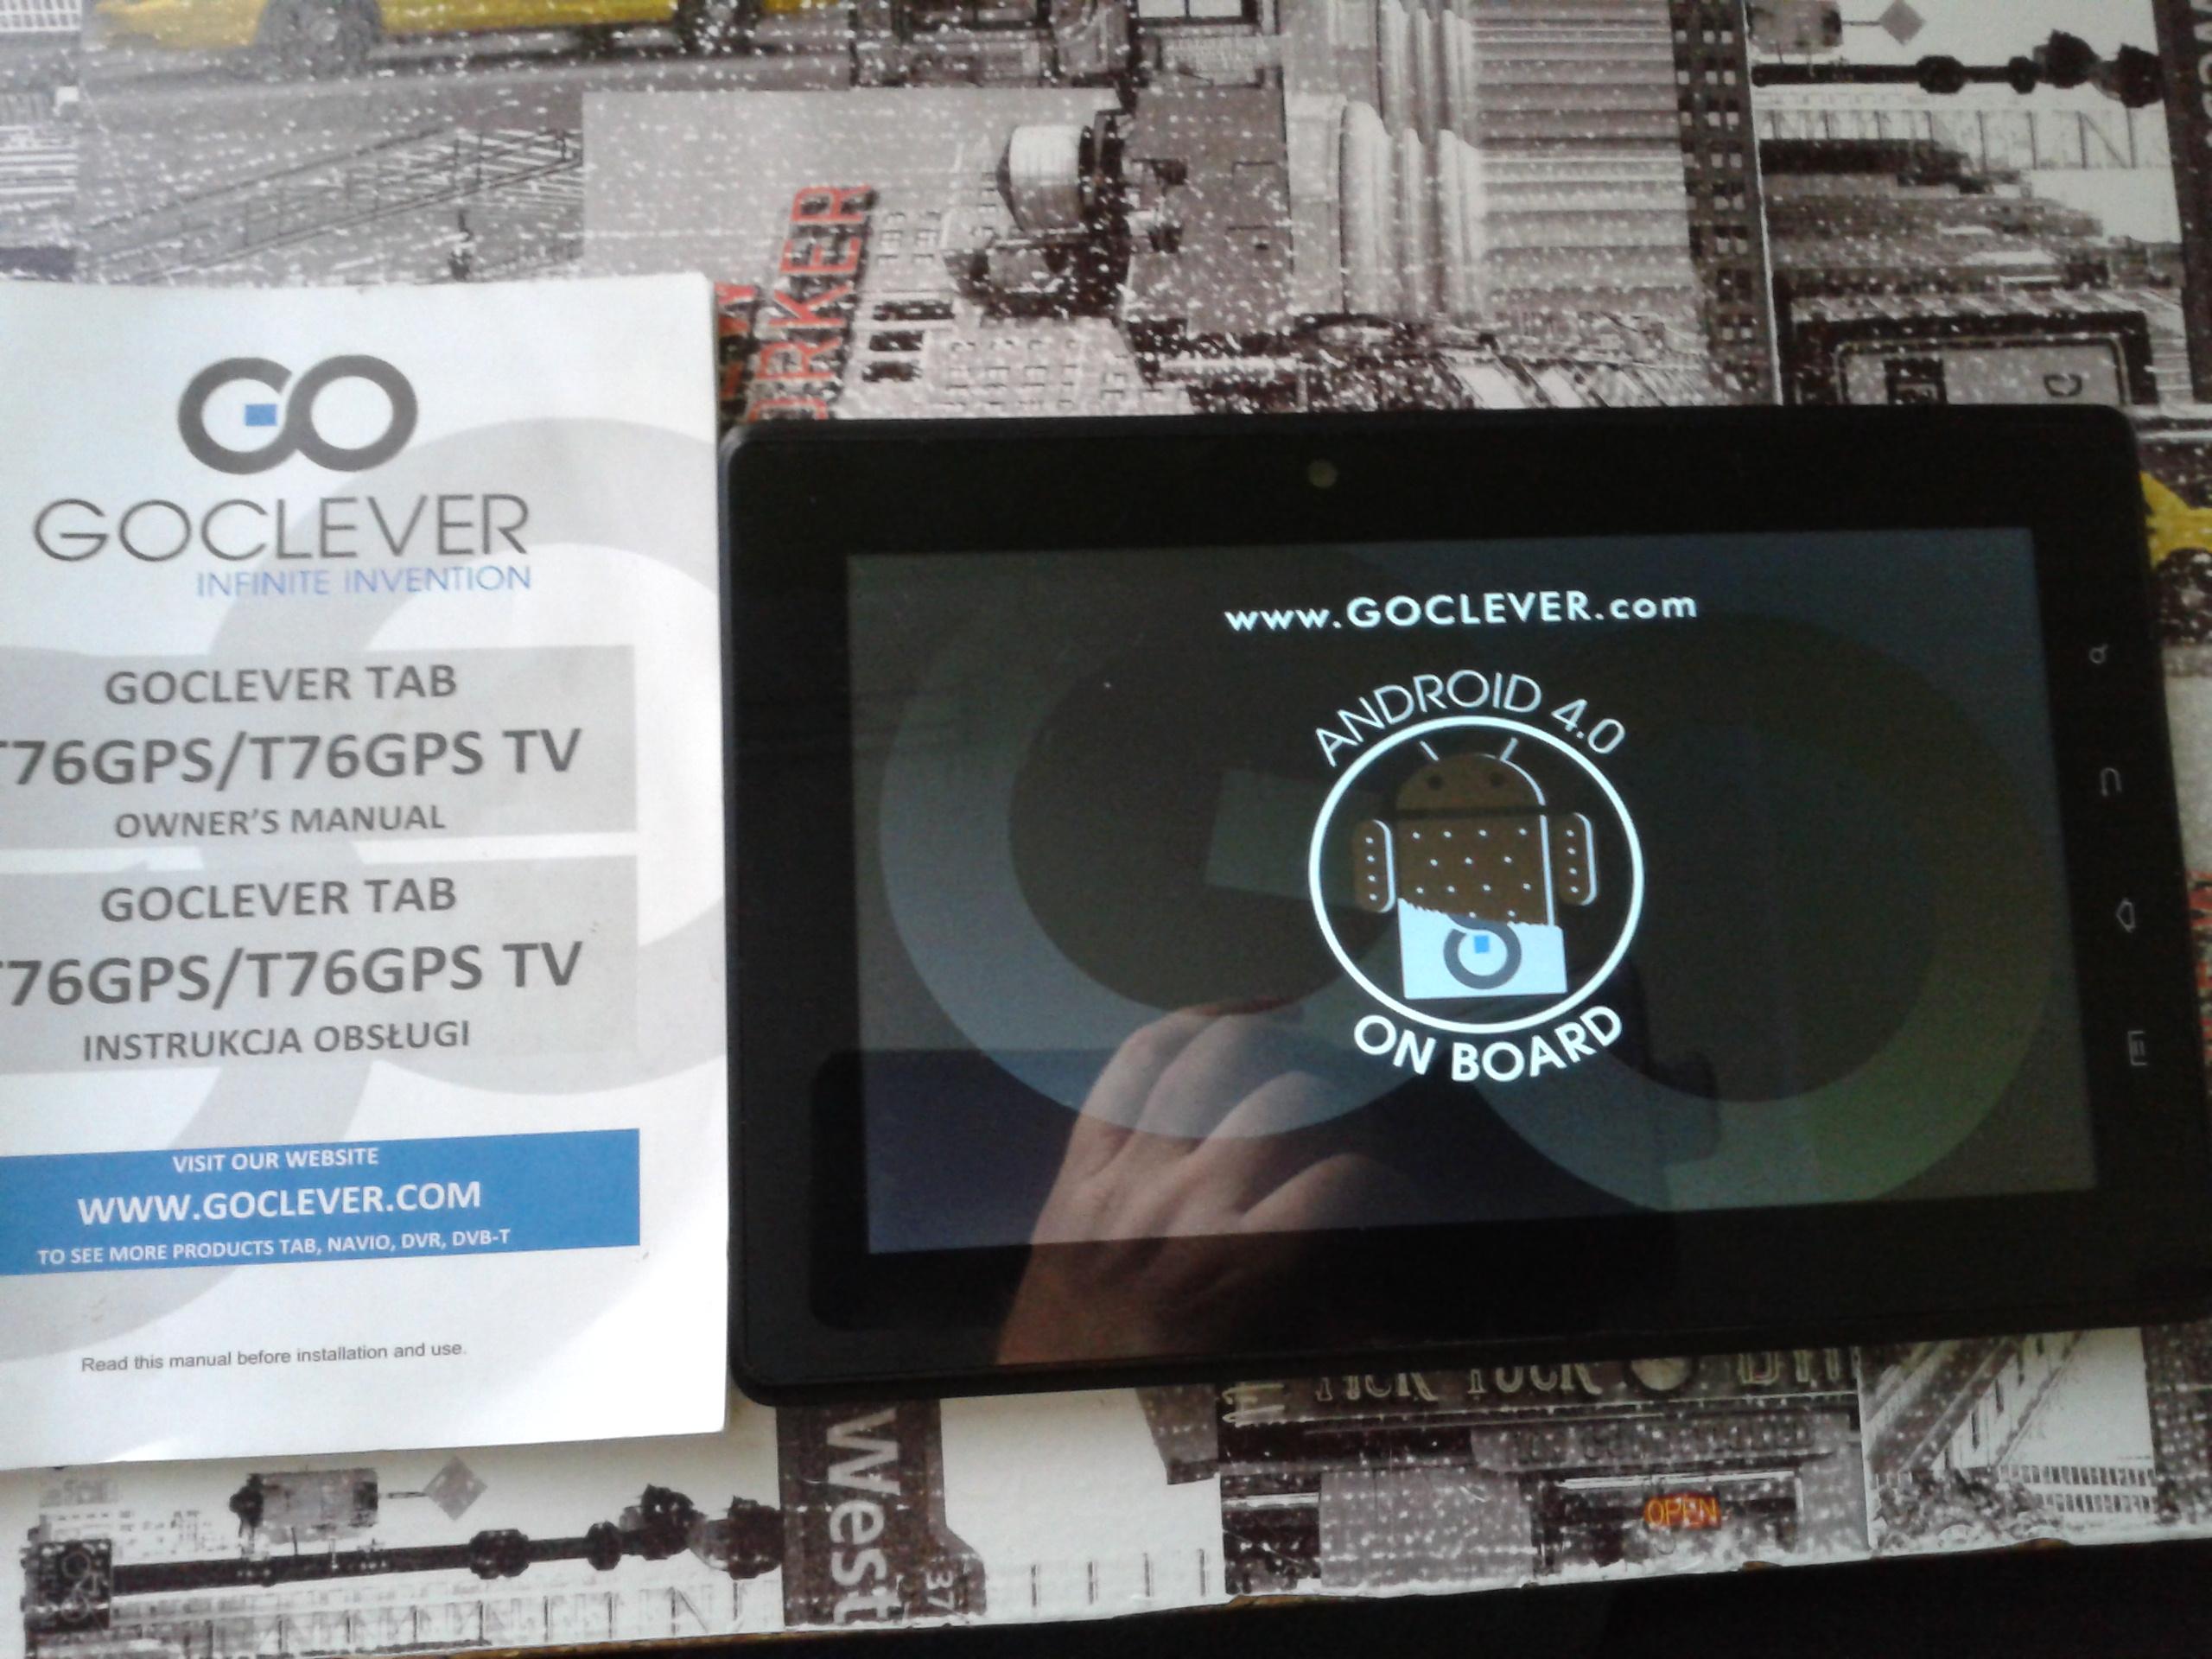 Goclever T76GPS TV - NIE URUCHAMIA SI� DO KO�CA